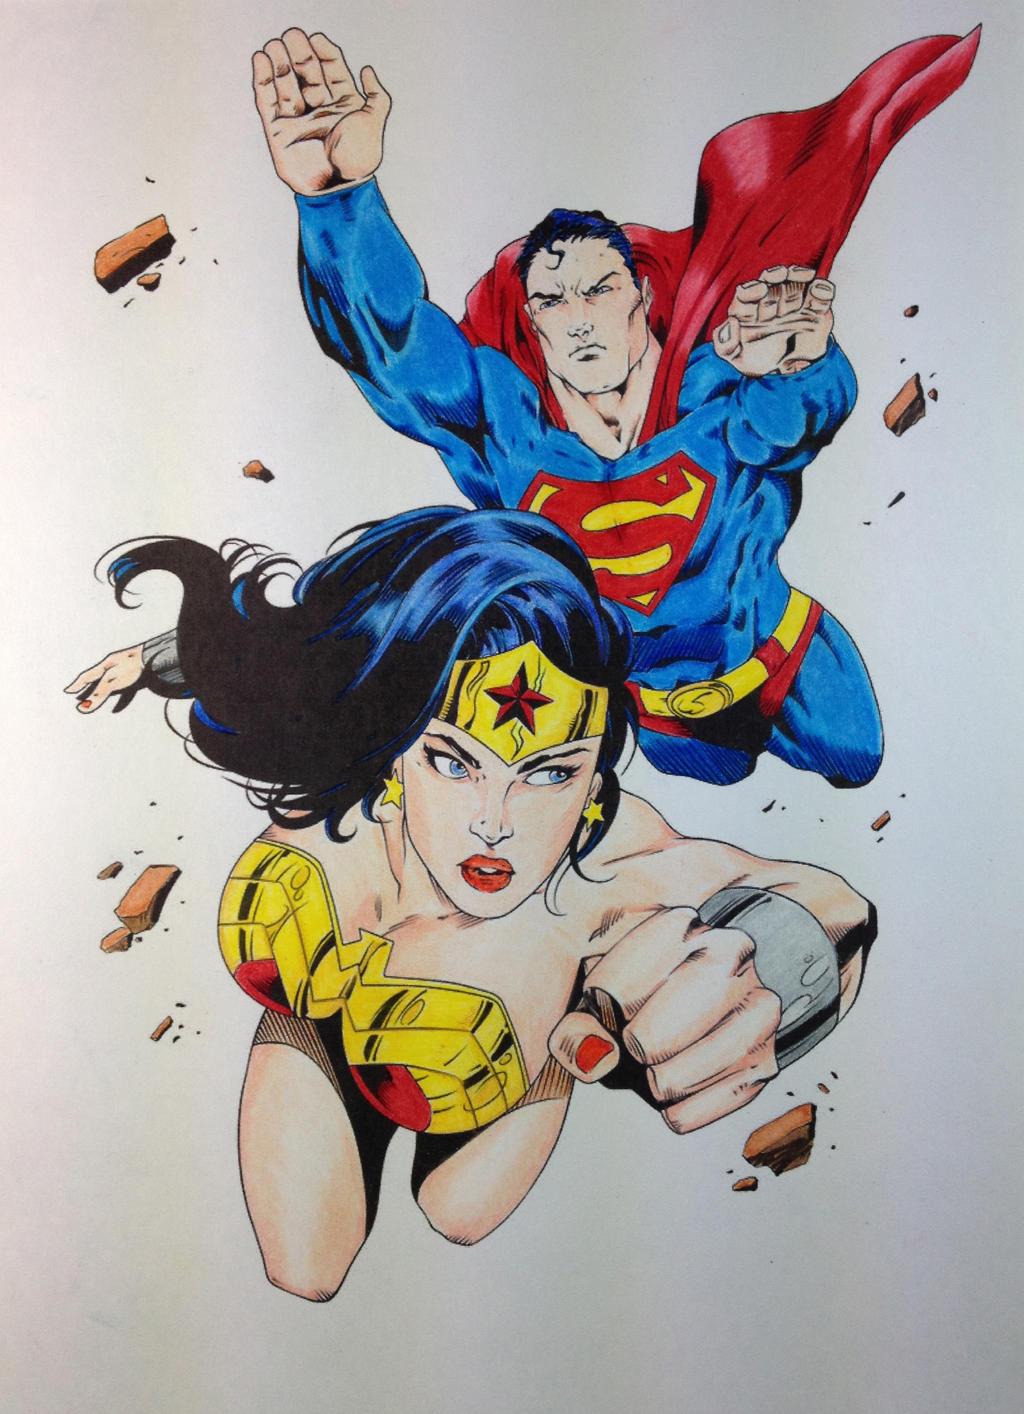 Wonderwoman superman flying colored by ssgjoey on deviantart - Superman wonder woman cartoon ...